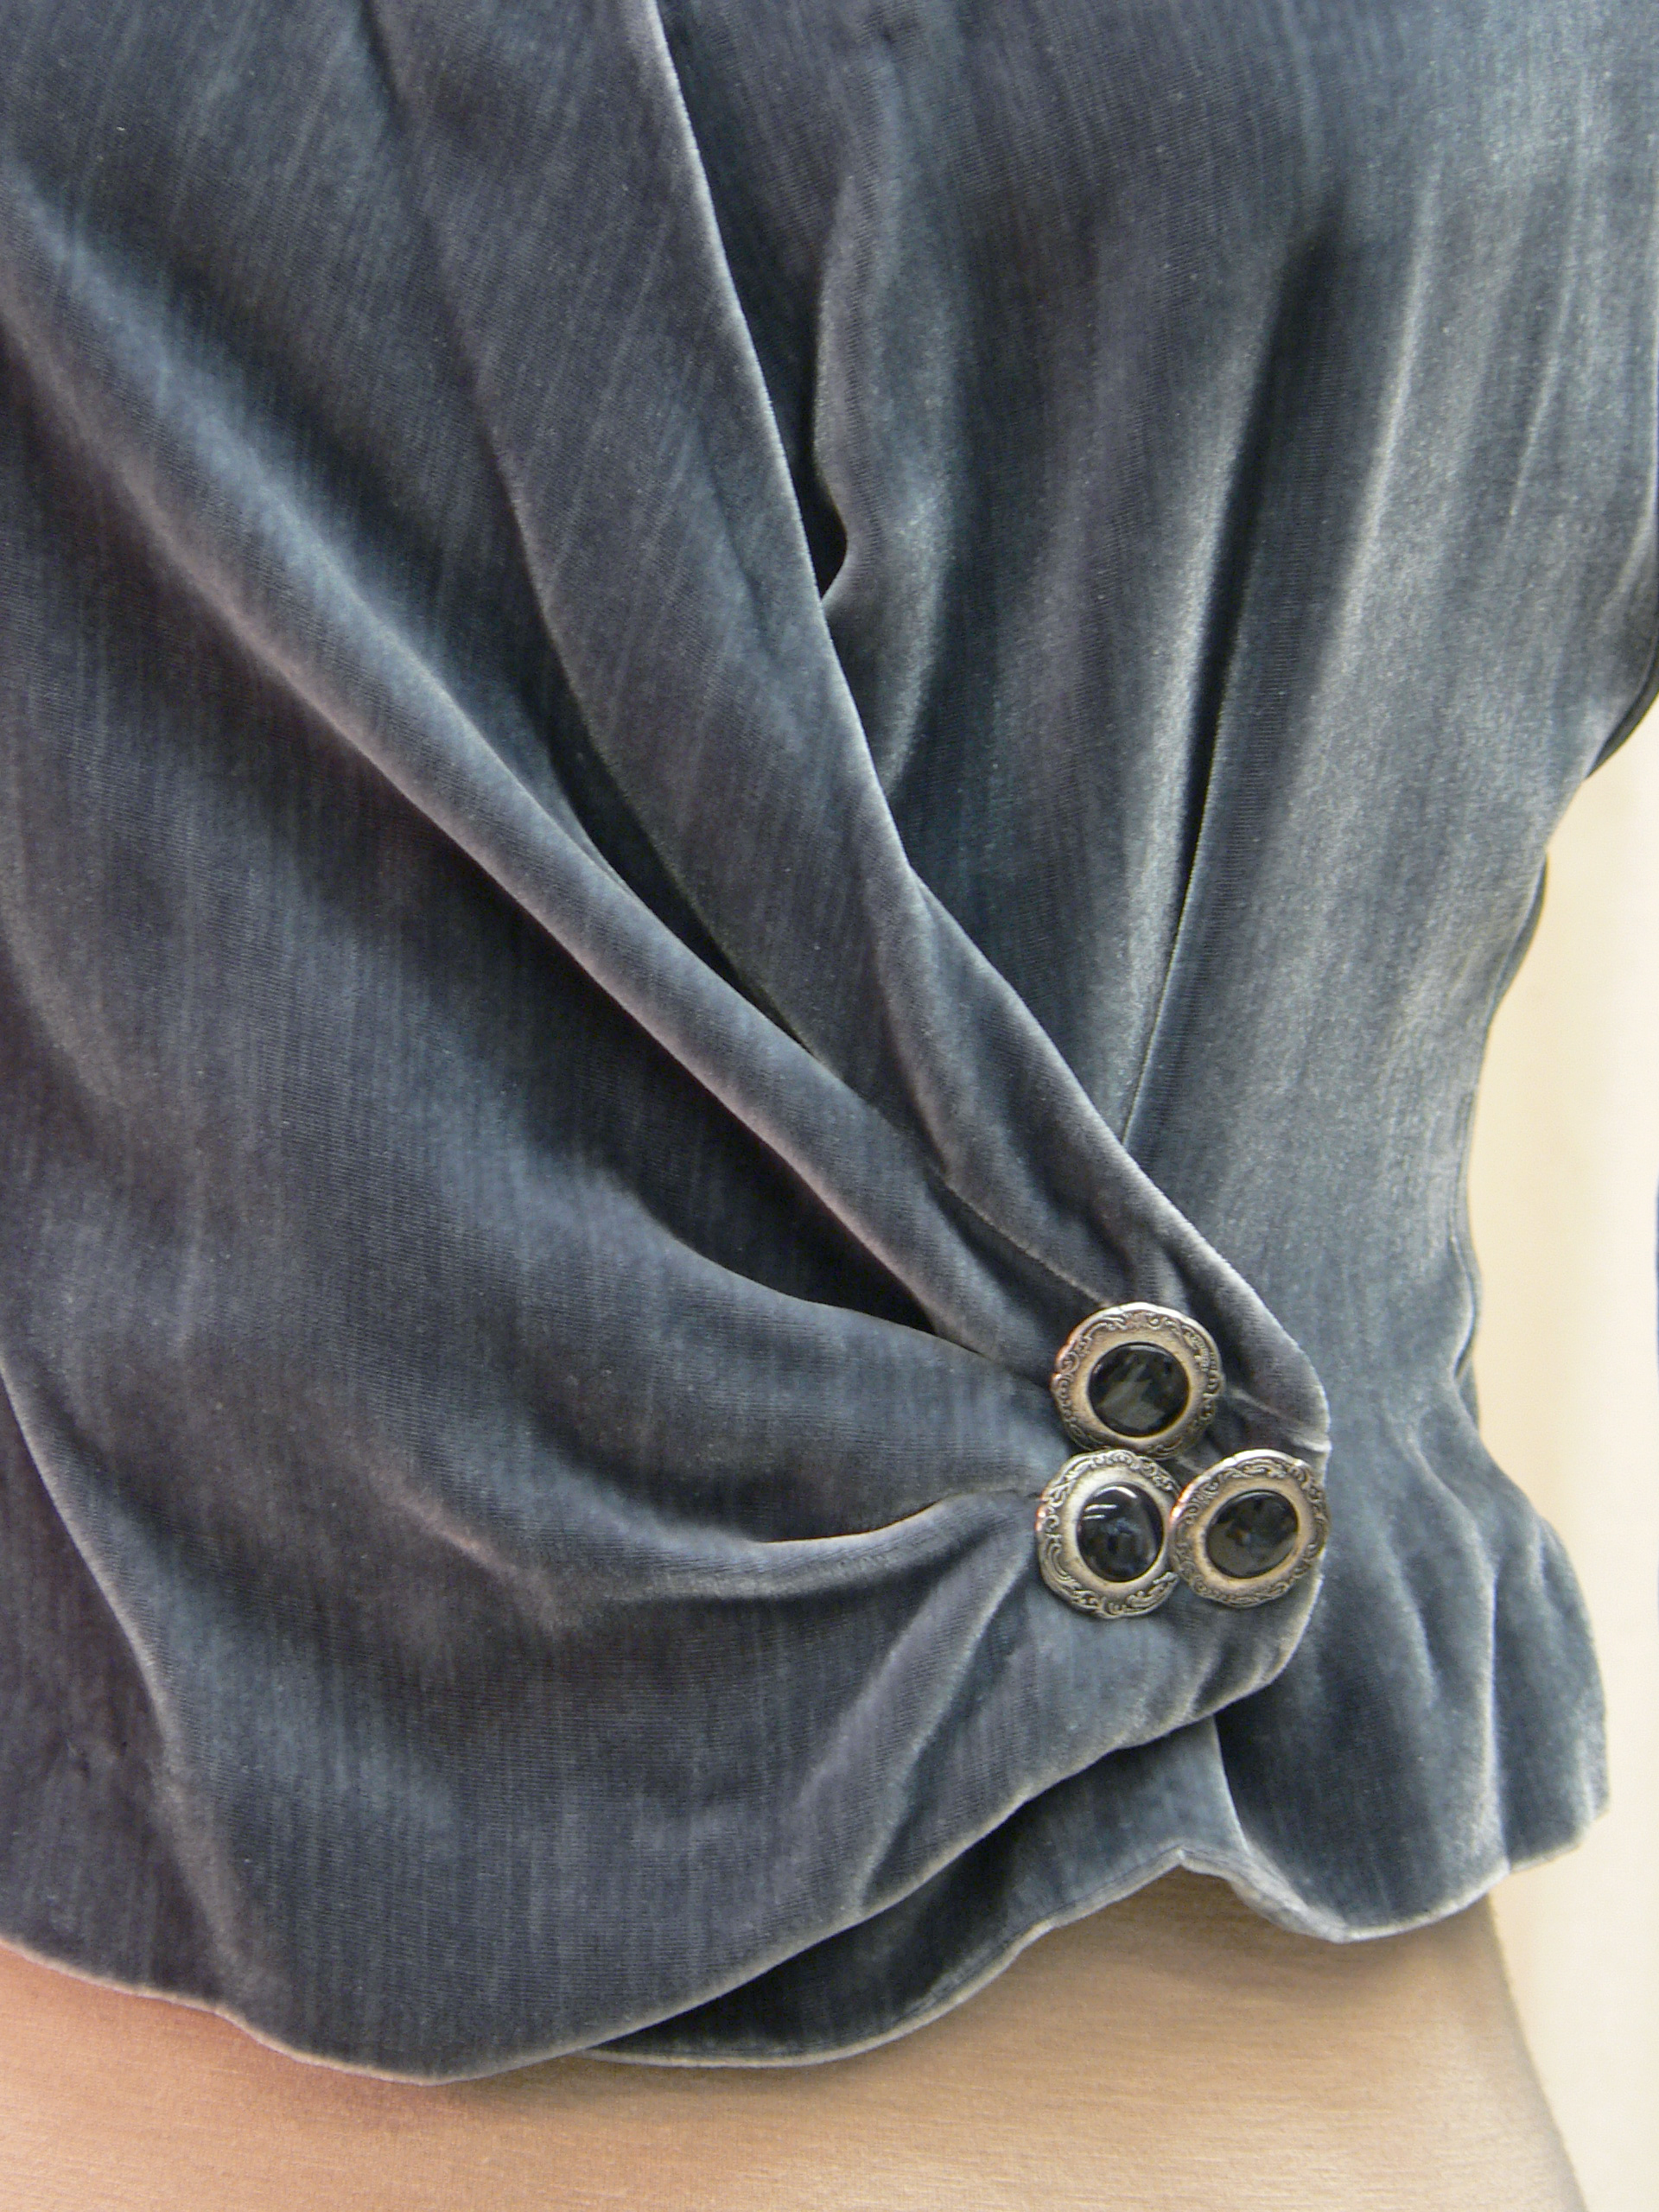 outerwear04_blouse_detail.jpg